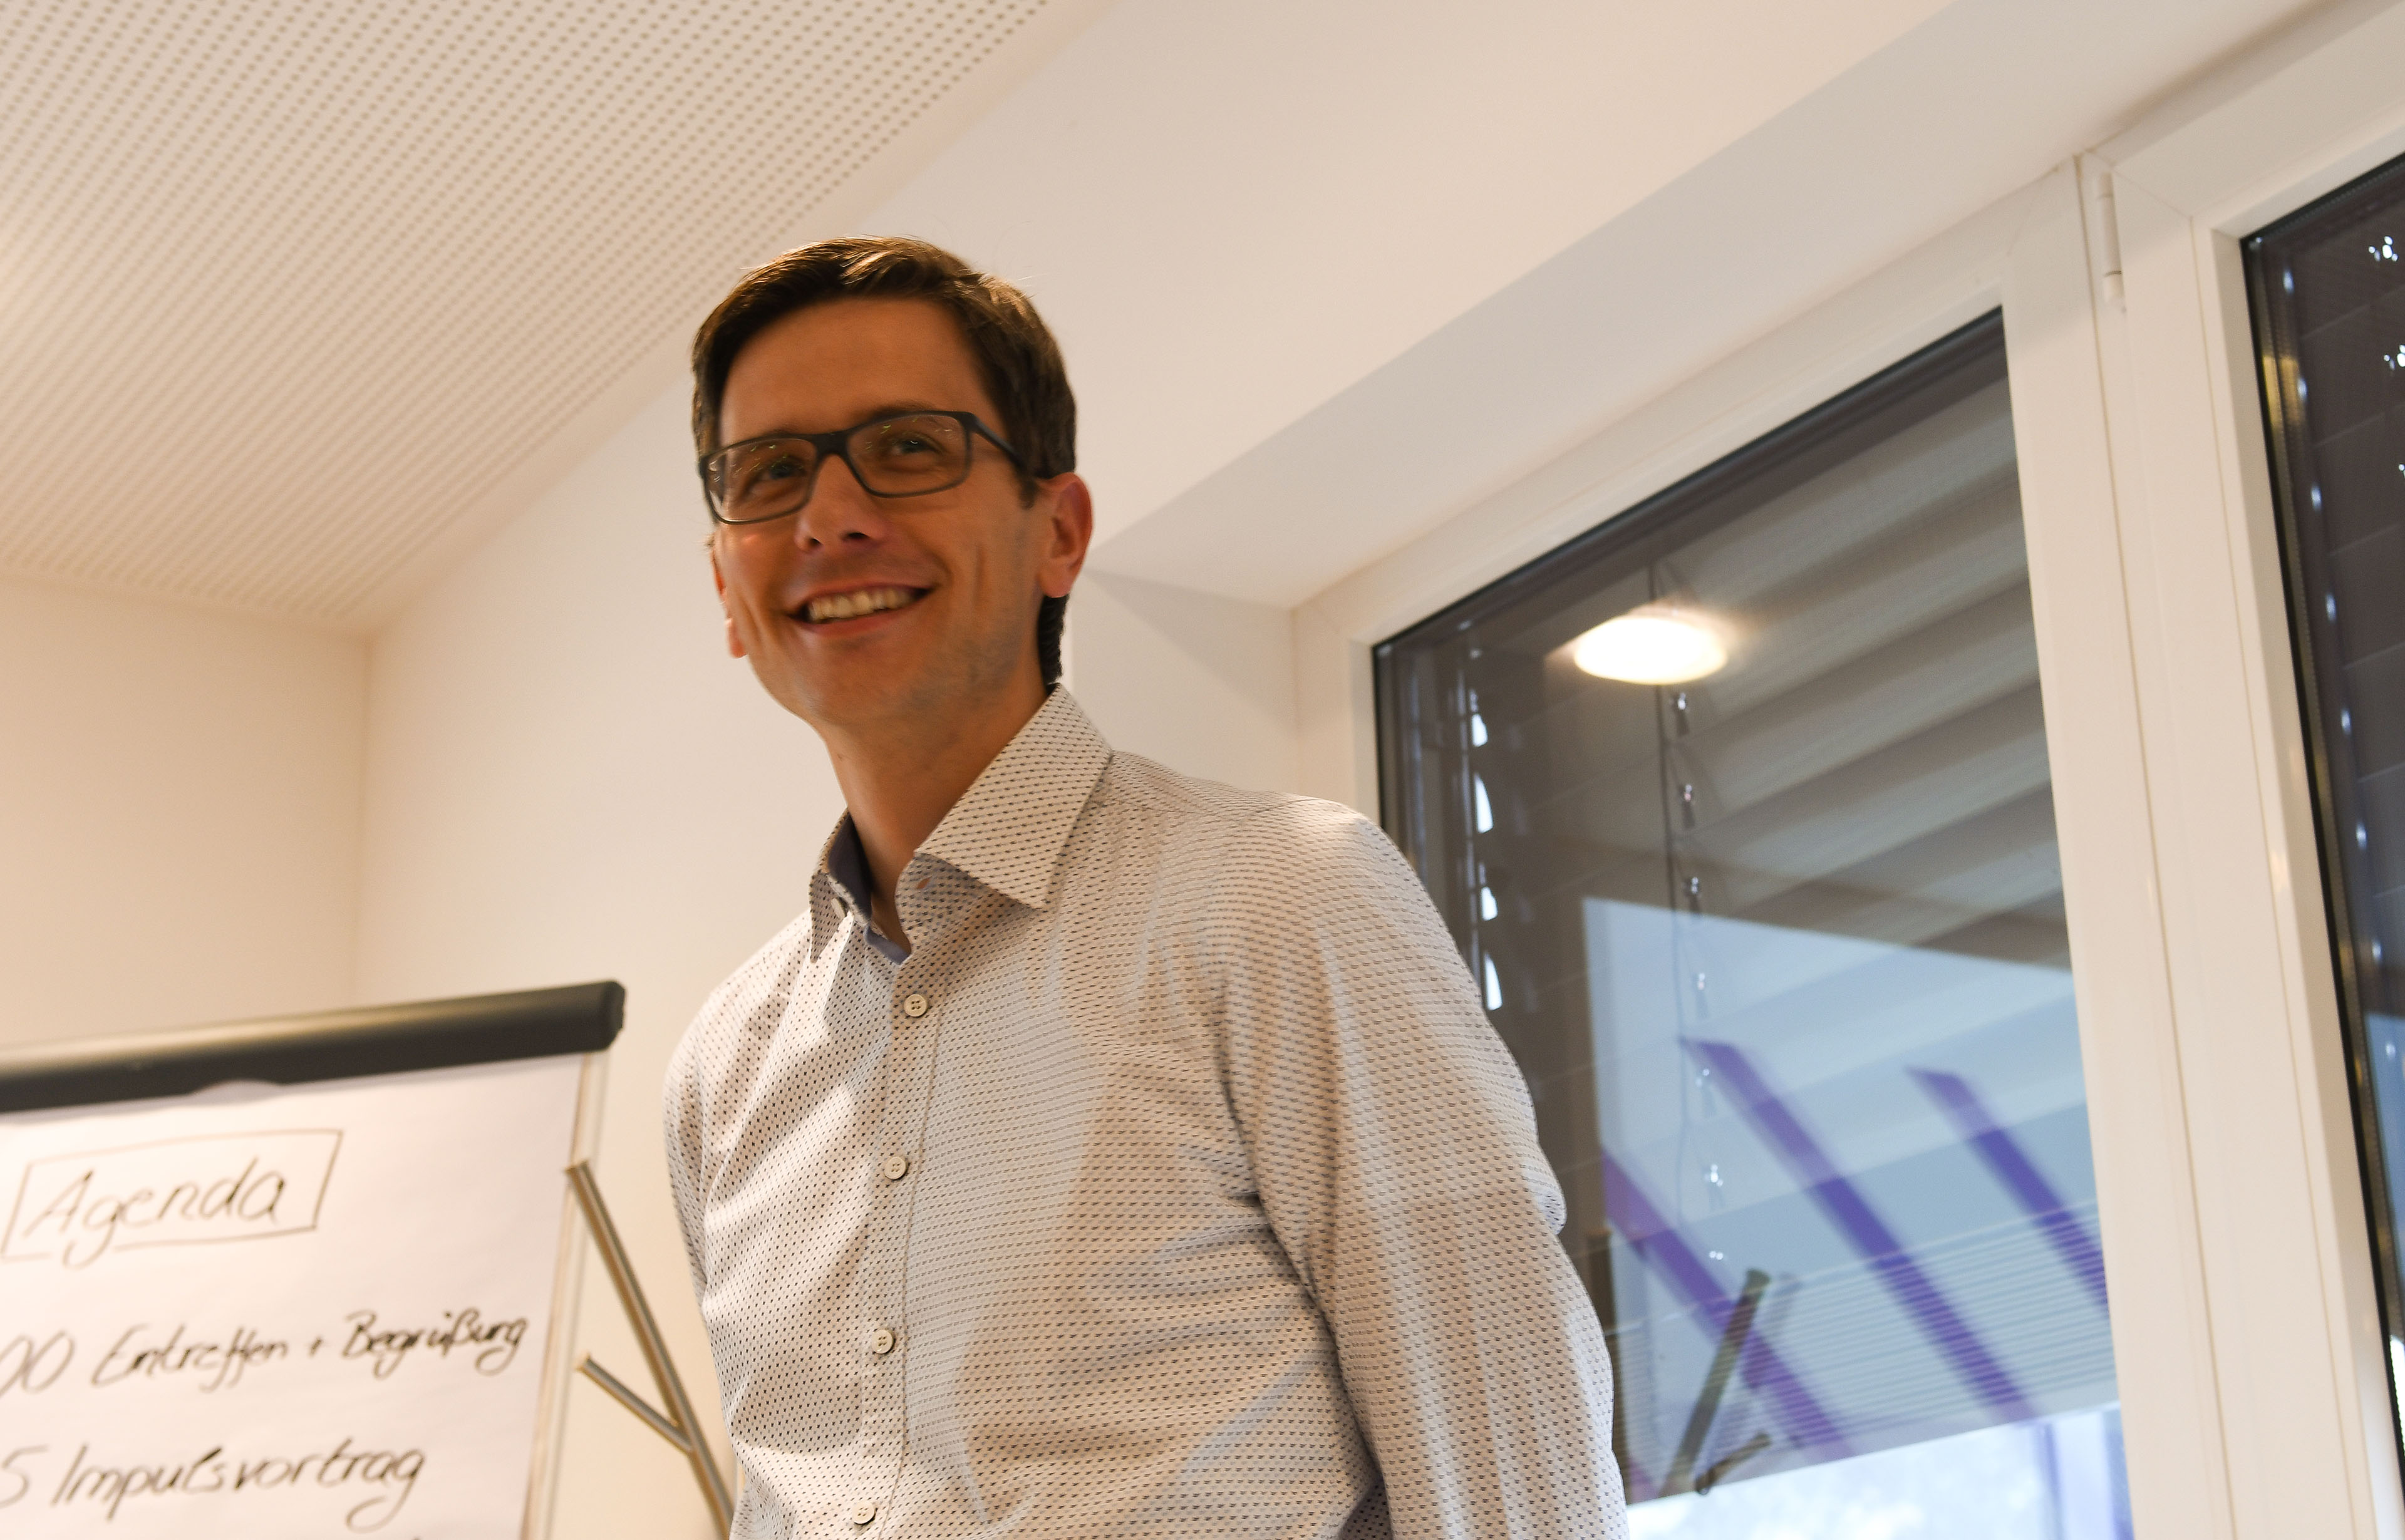 Prof. Dr. Michael Bücker